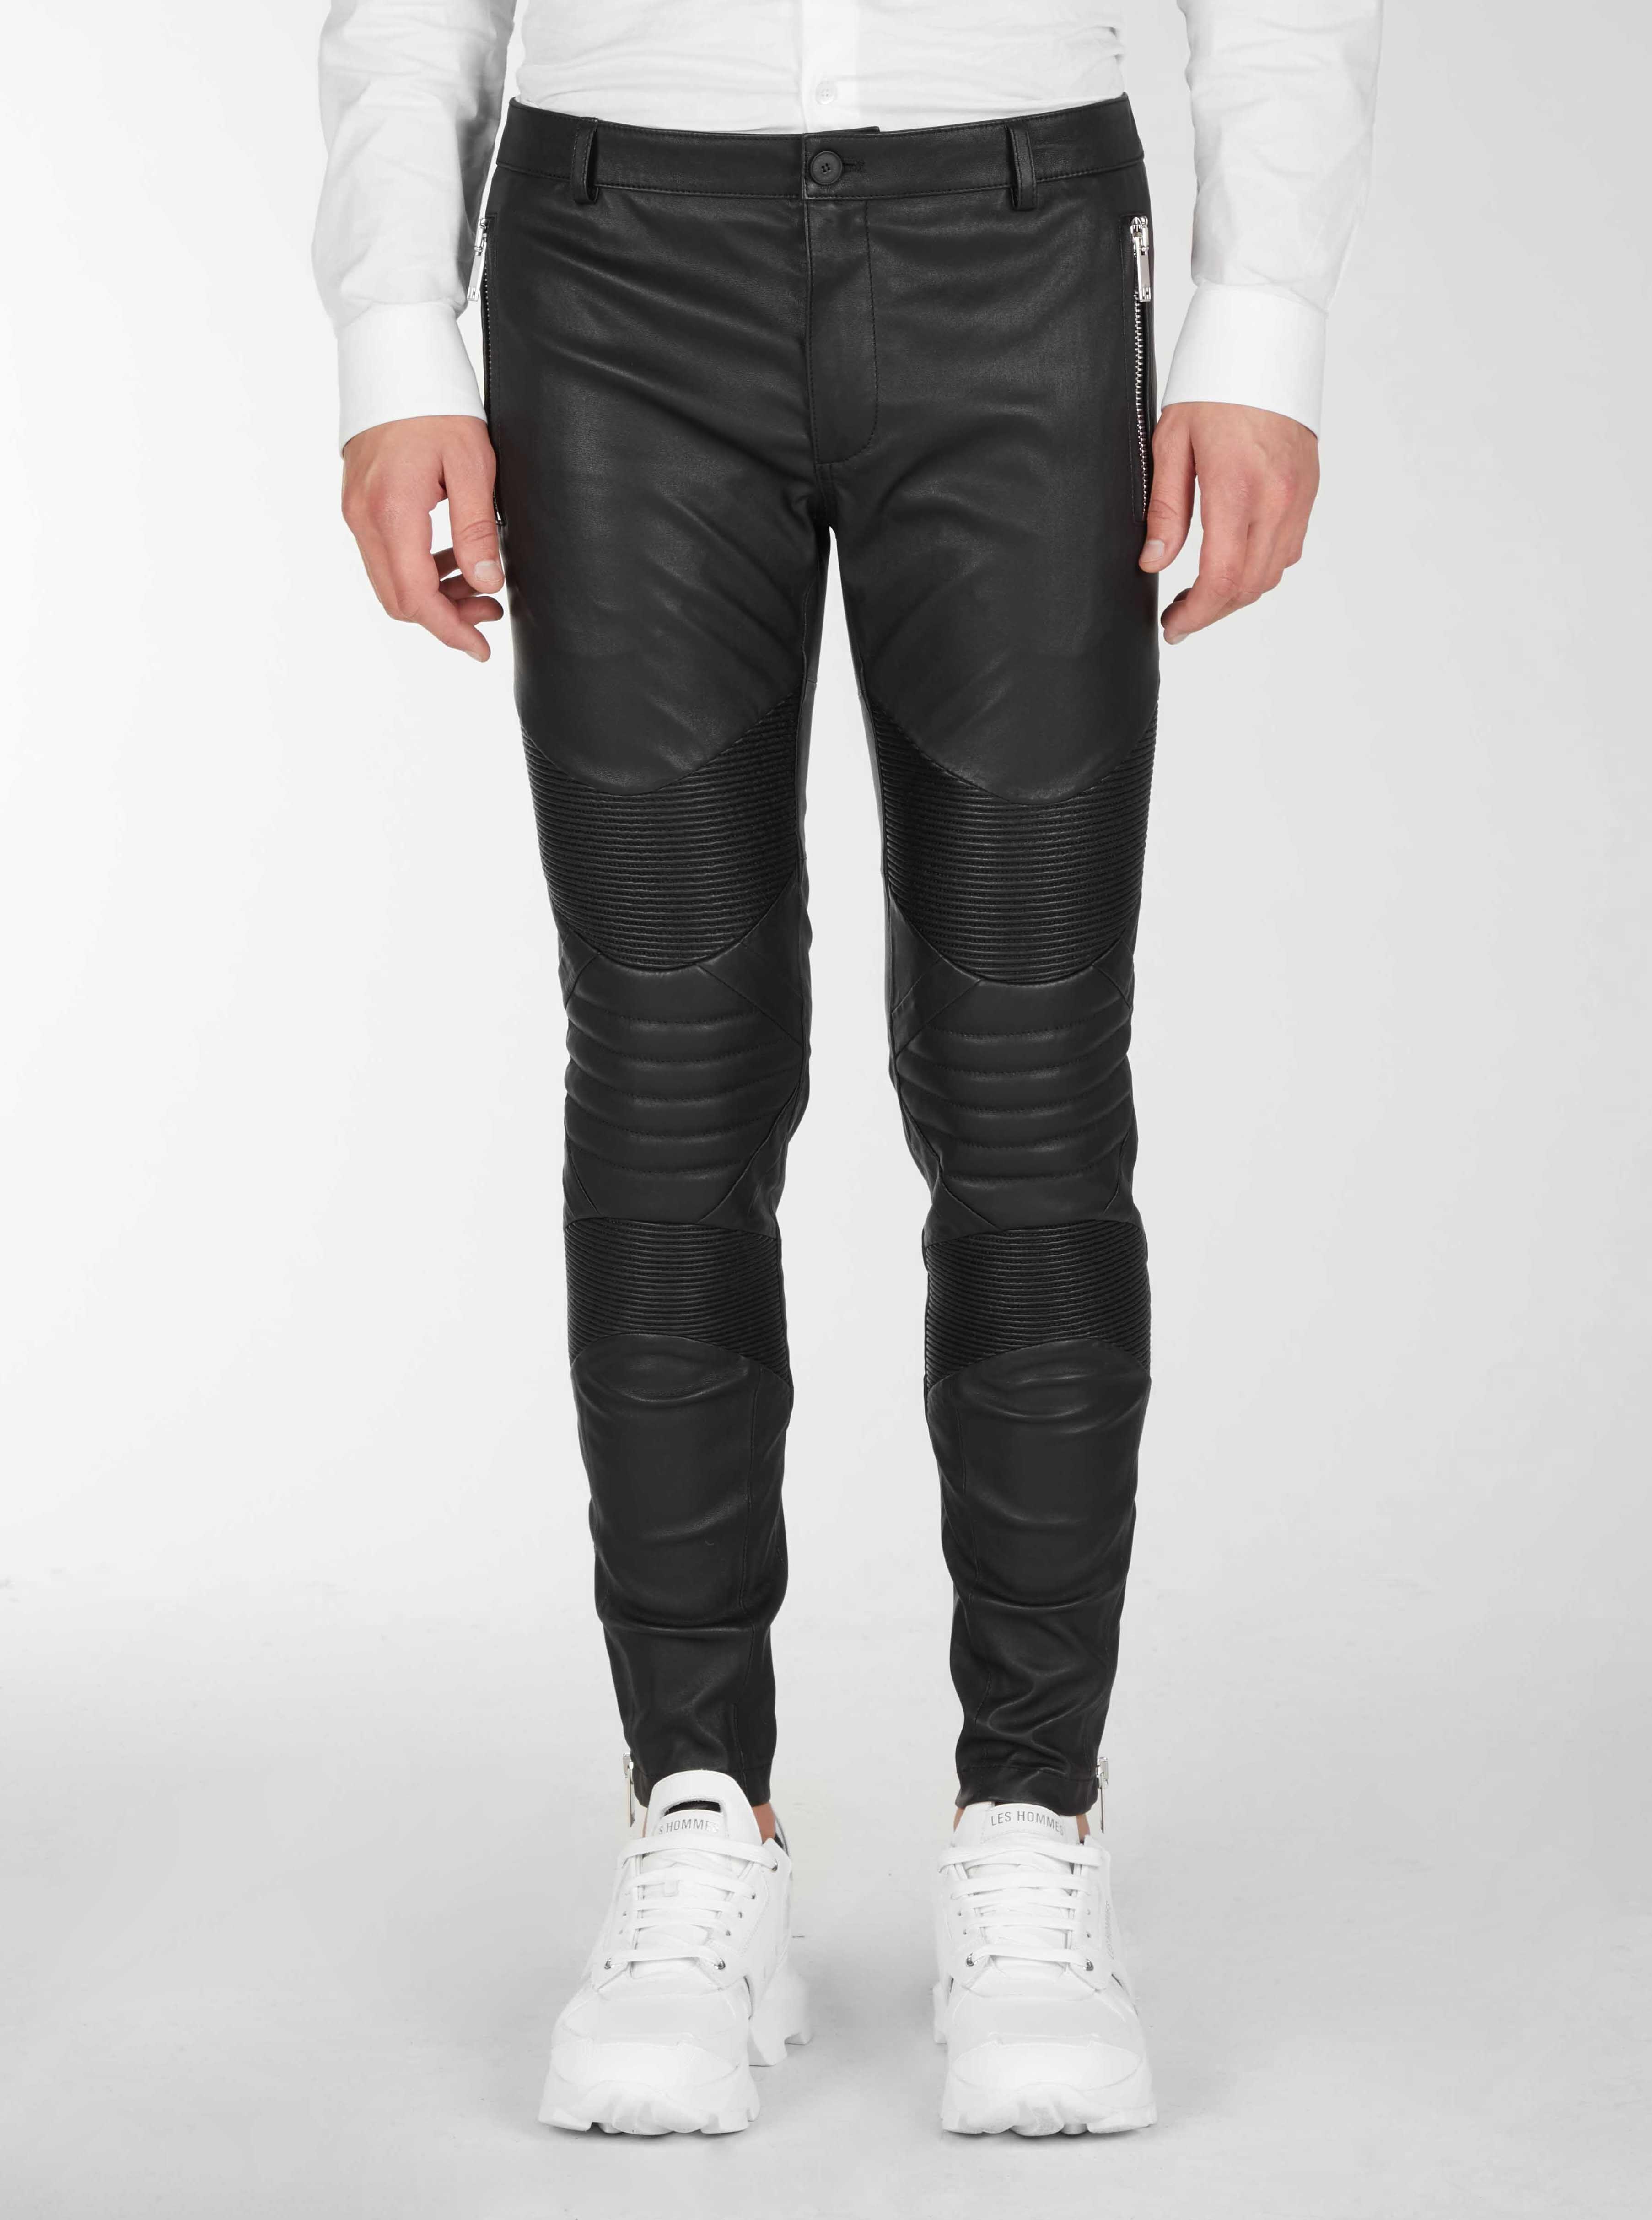 Pantaloni da motociclista in pelle - Les Hommes